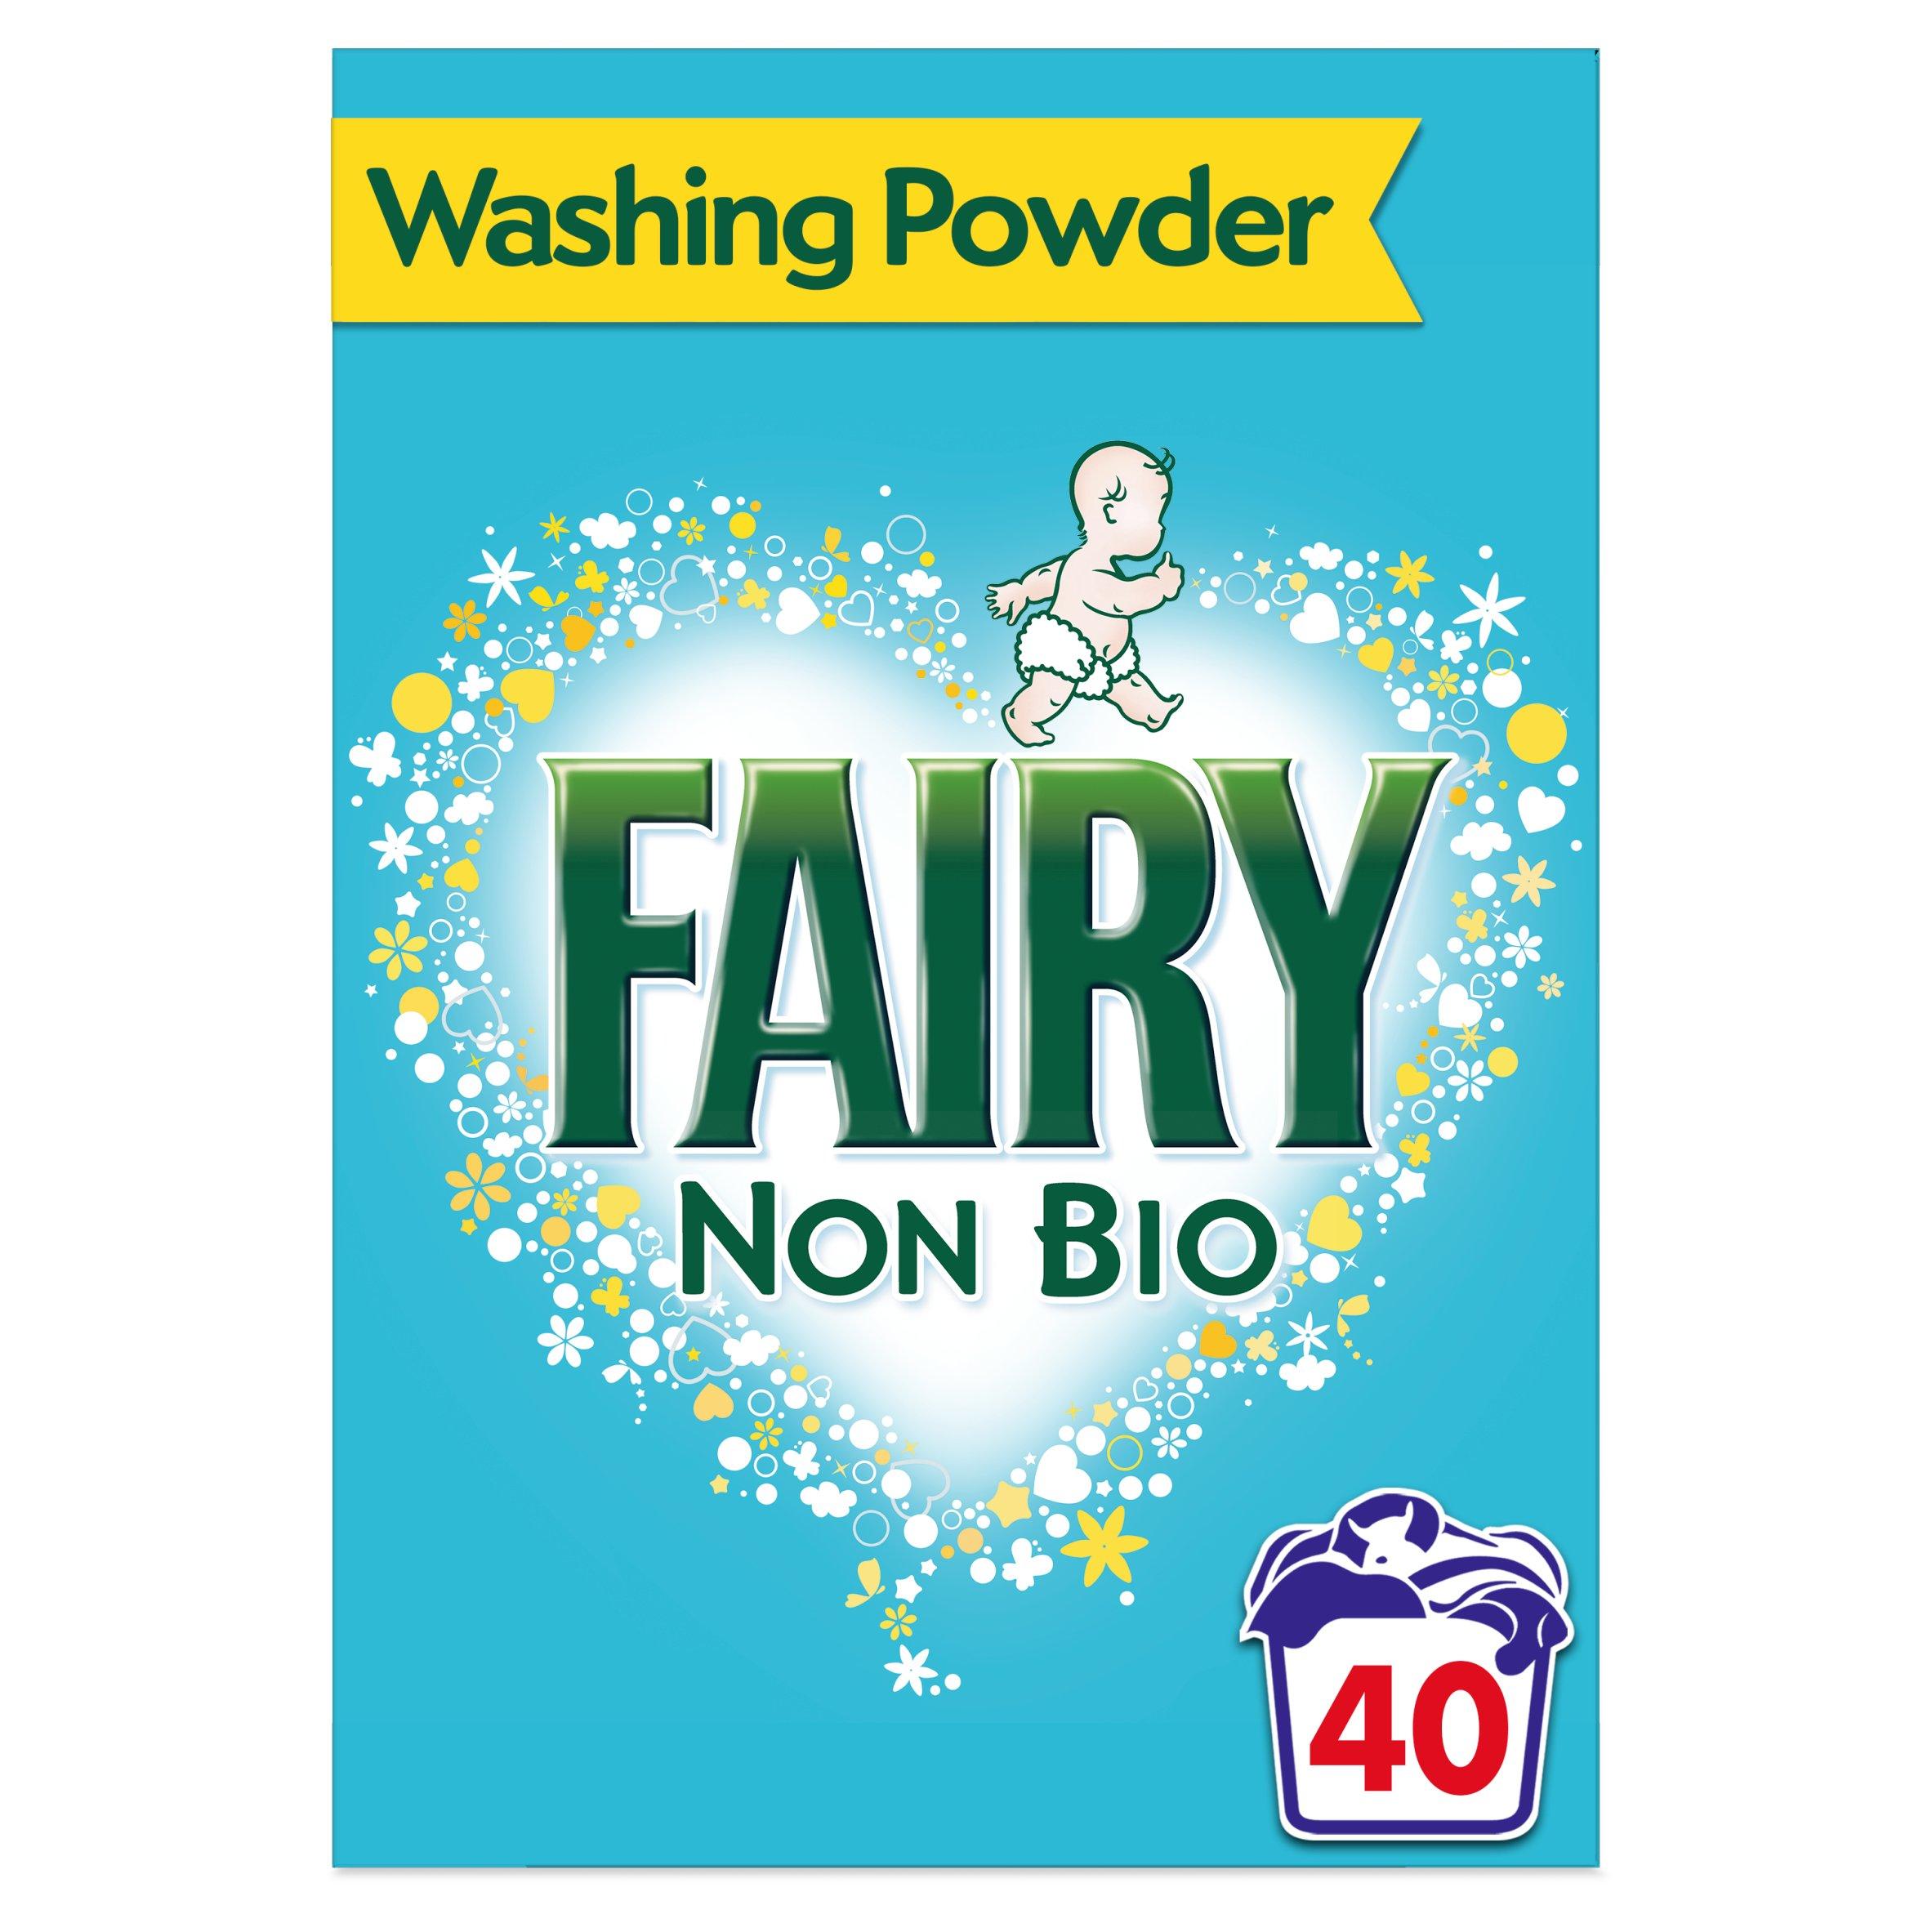 Fairy Non Bio. Washing Powder 40 Washes 2.6Kg